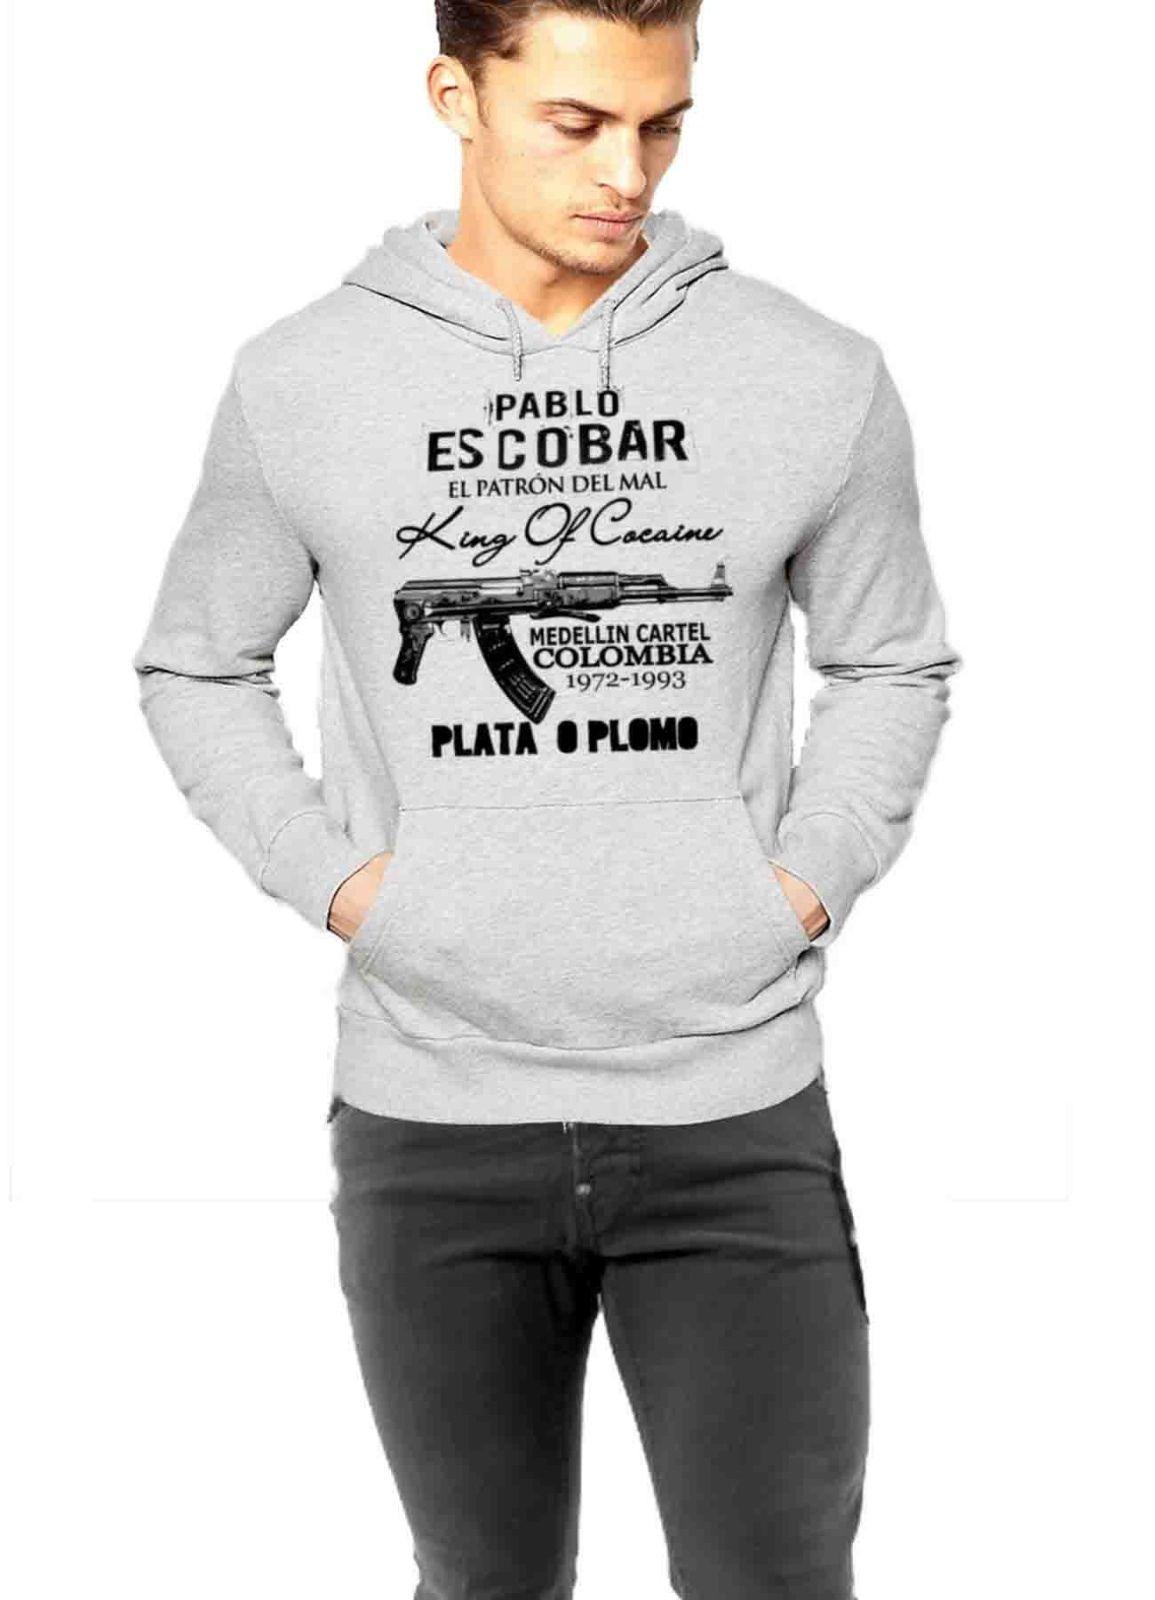 pablo escobar hoodie medellin cartel king of cocaine plata. Black Bedroom Furniture Sets. Home Design Ideas